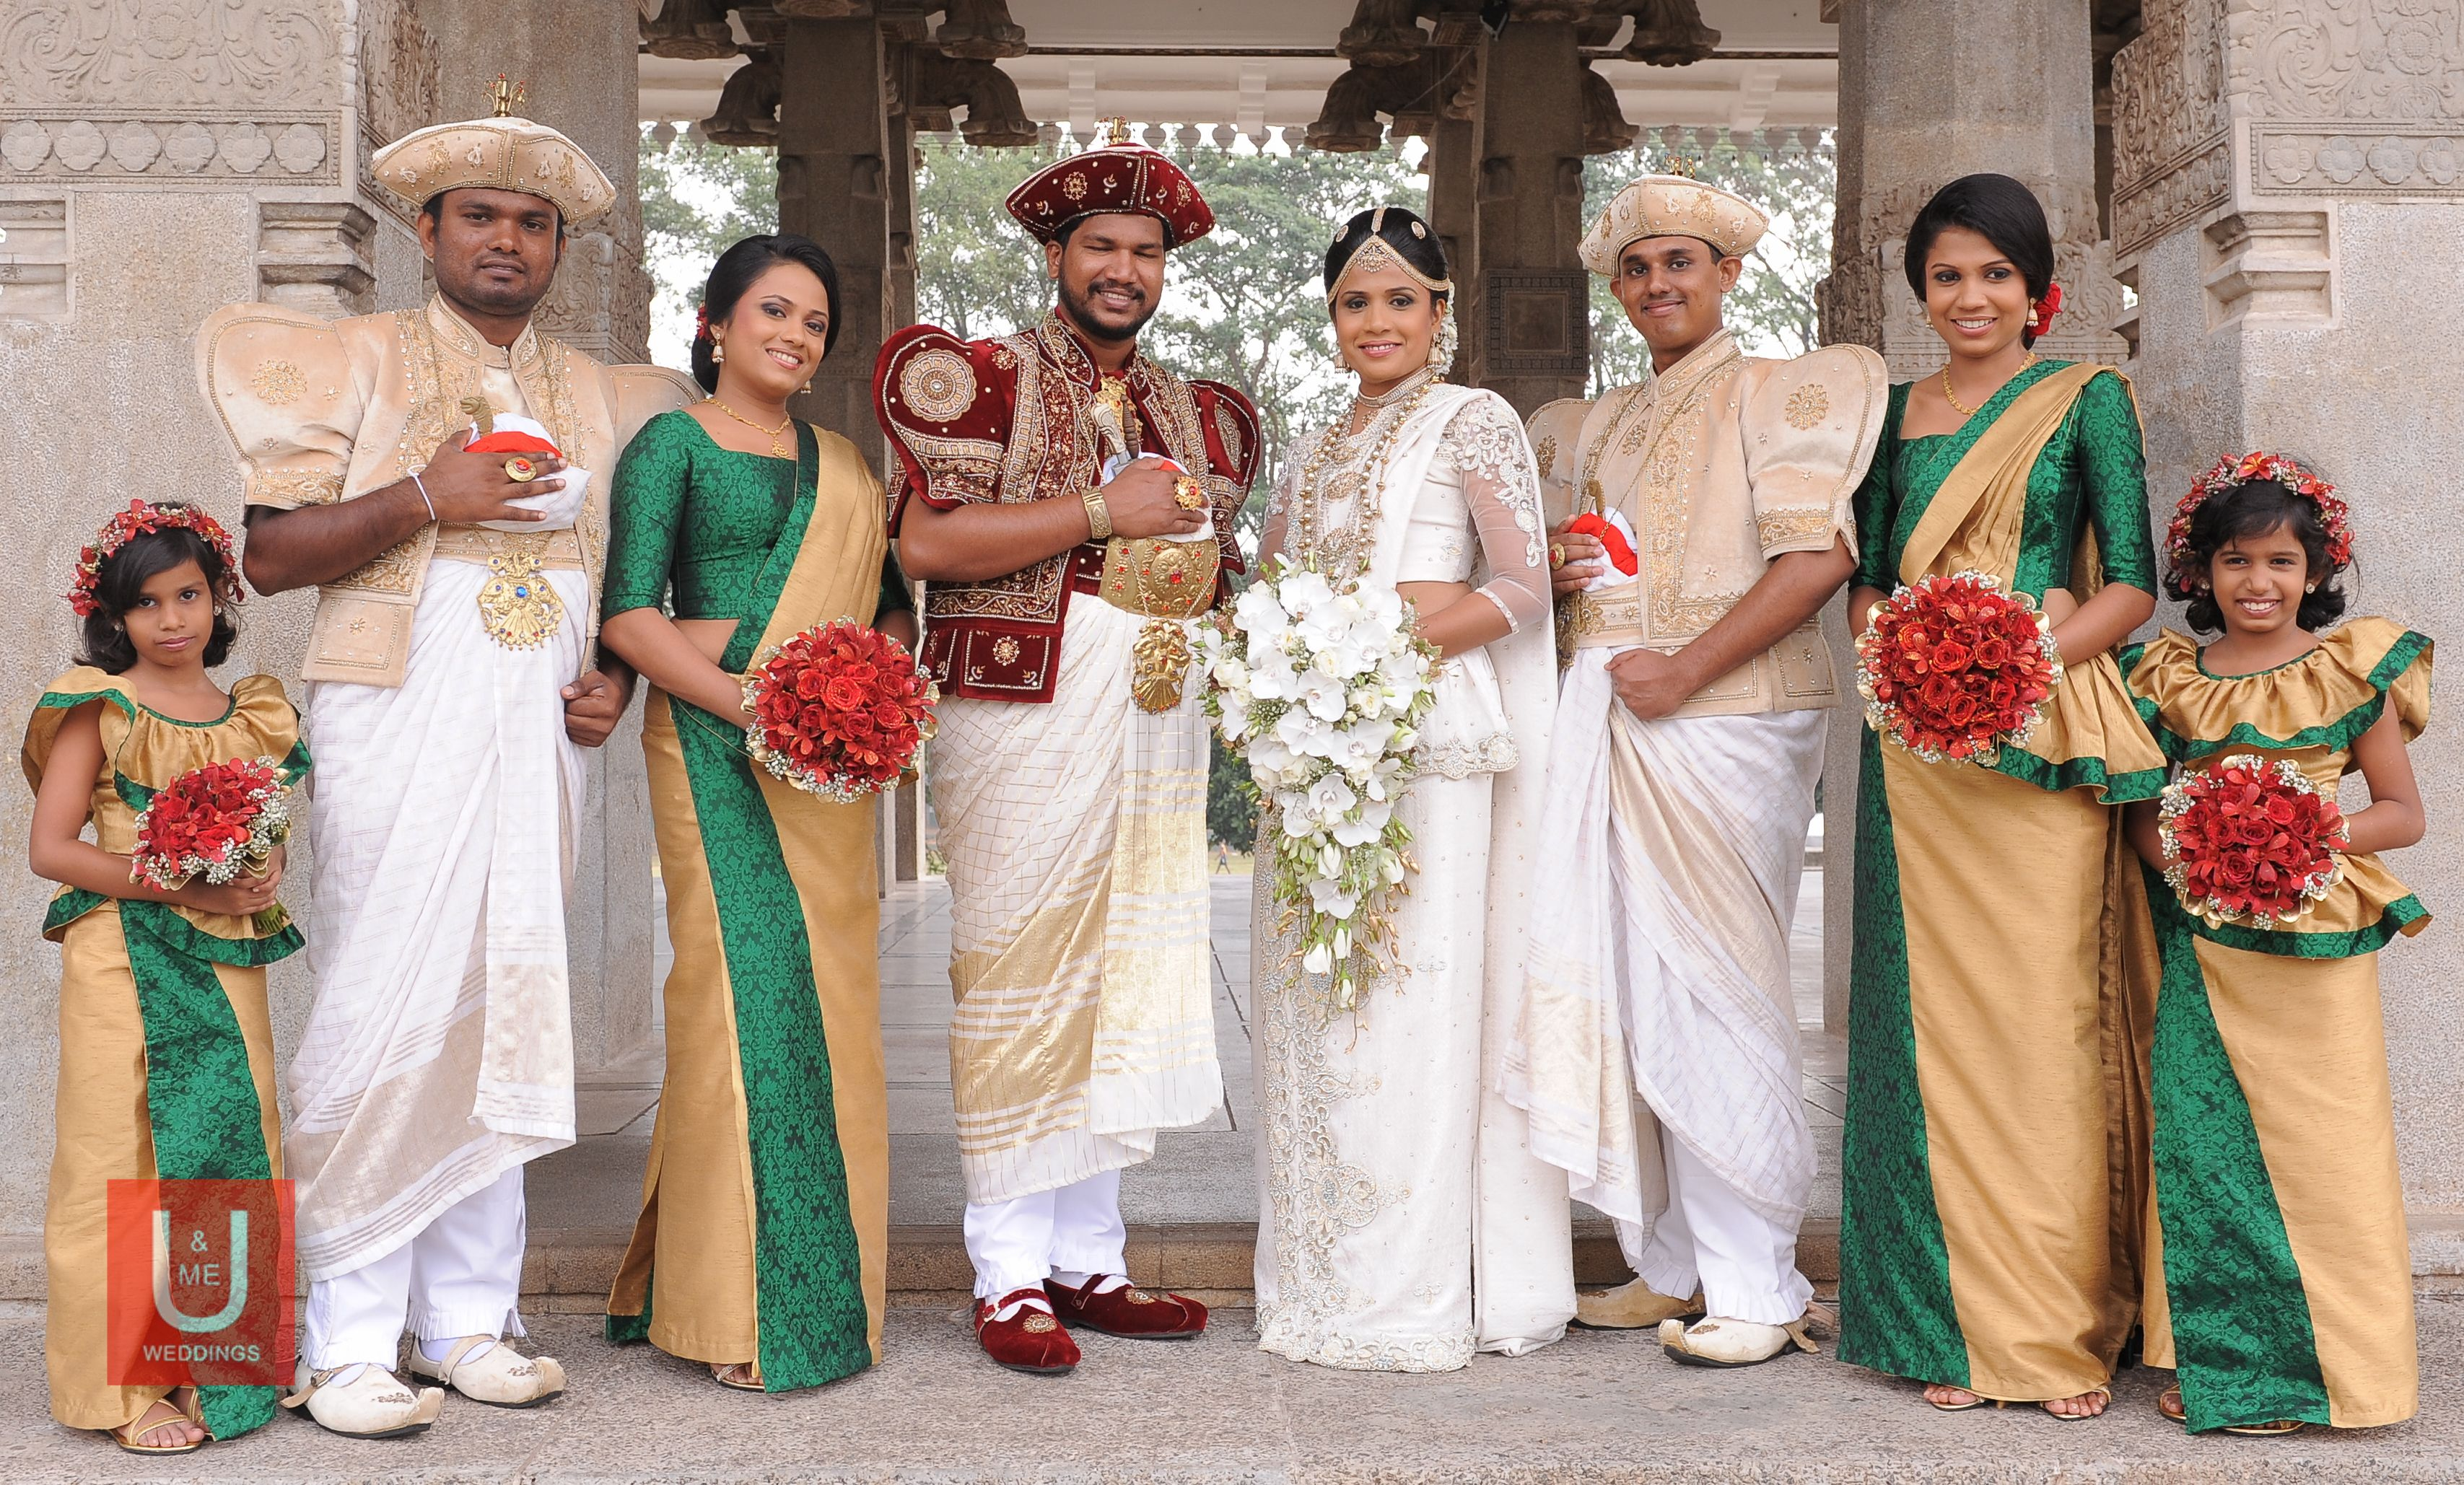 Sri lankan traditional wedding group photo sri lankan for Typical wedding photos